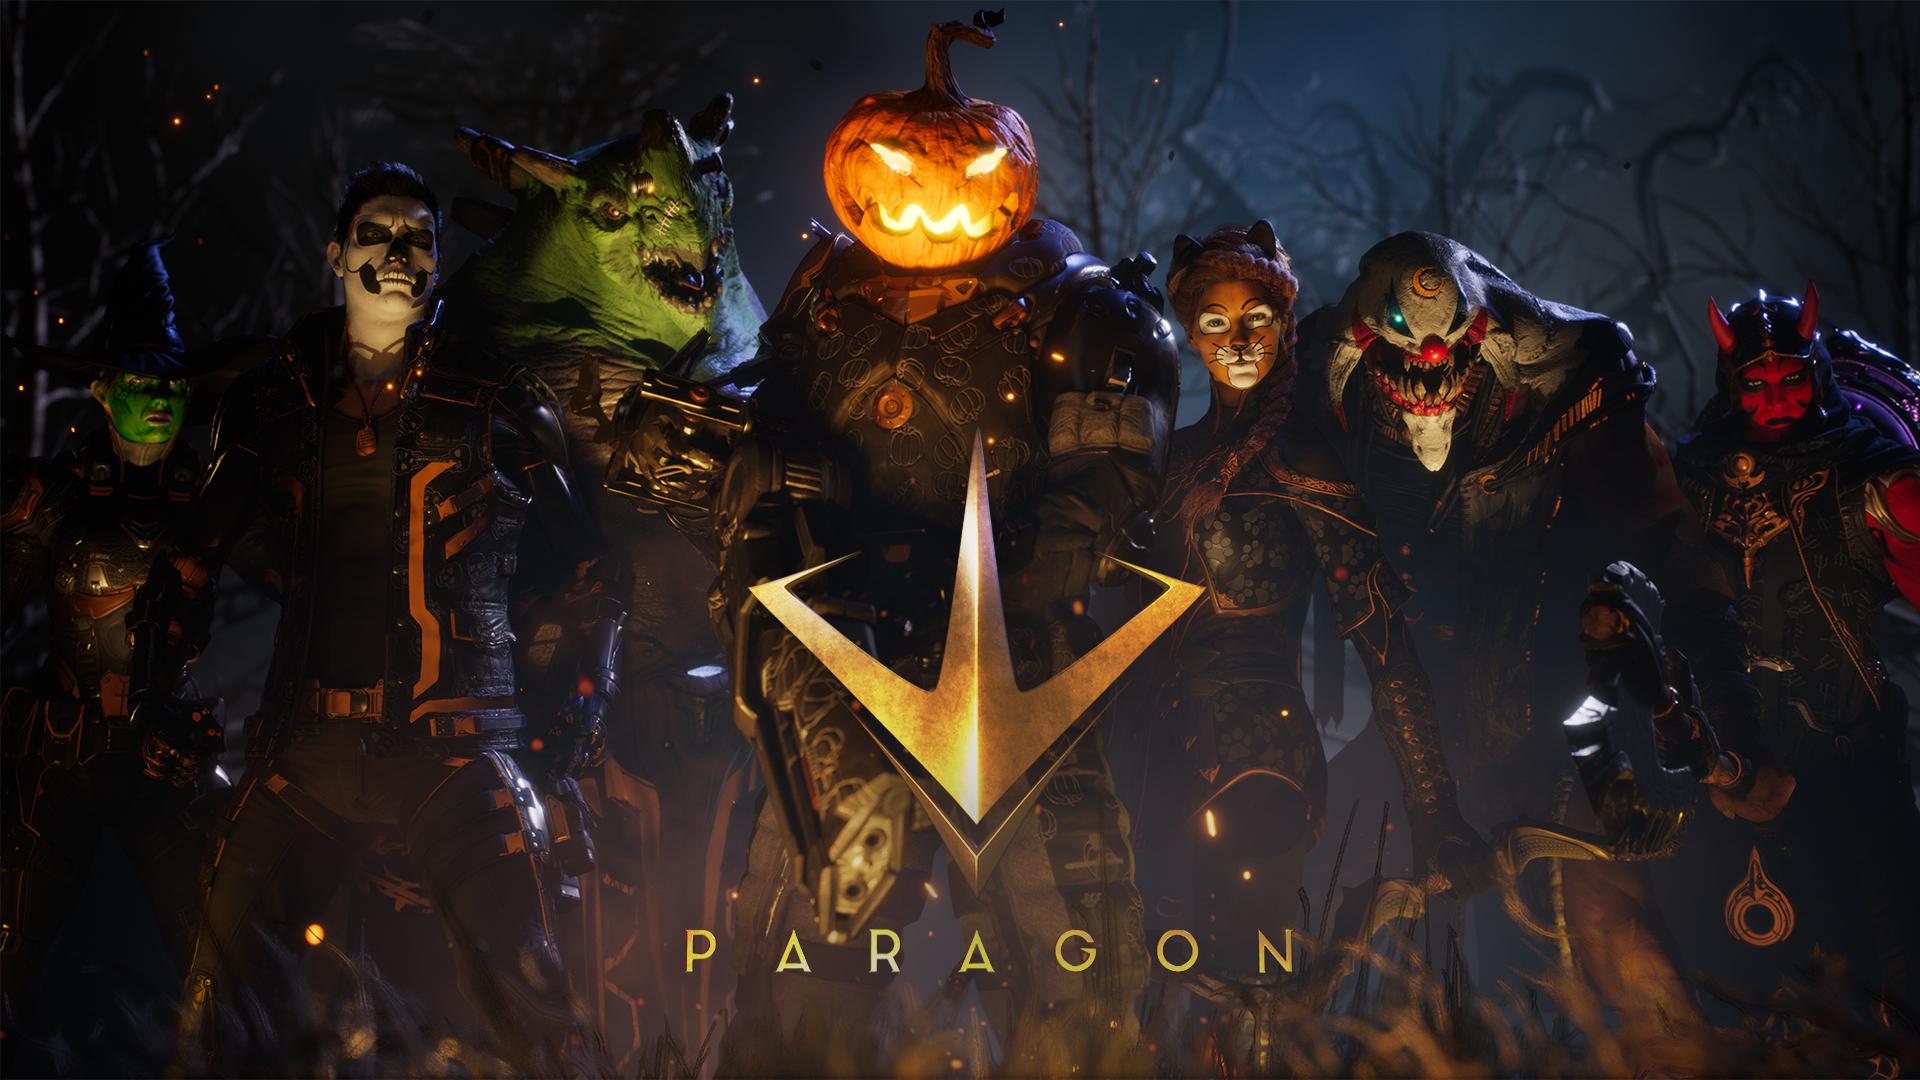 Paragon Halloween